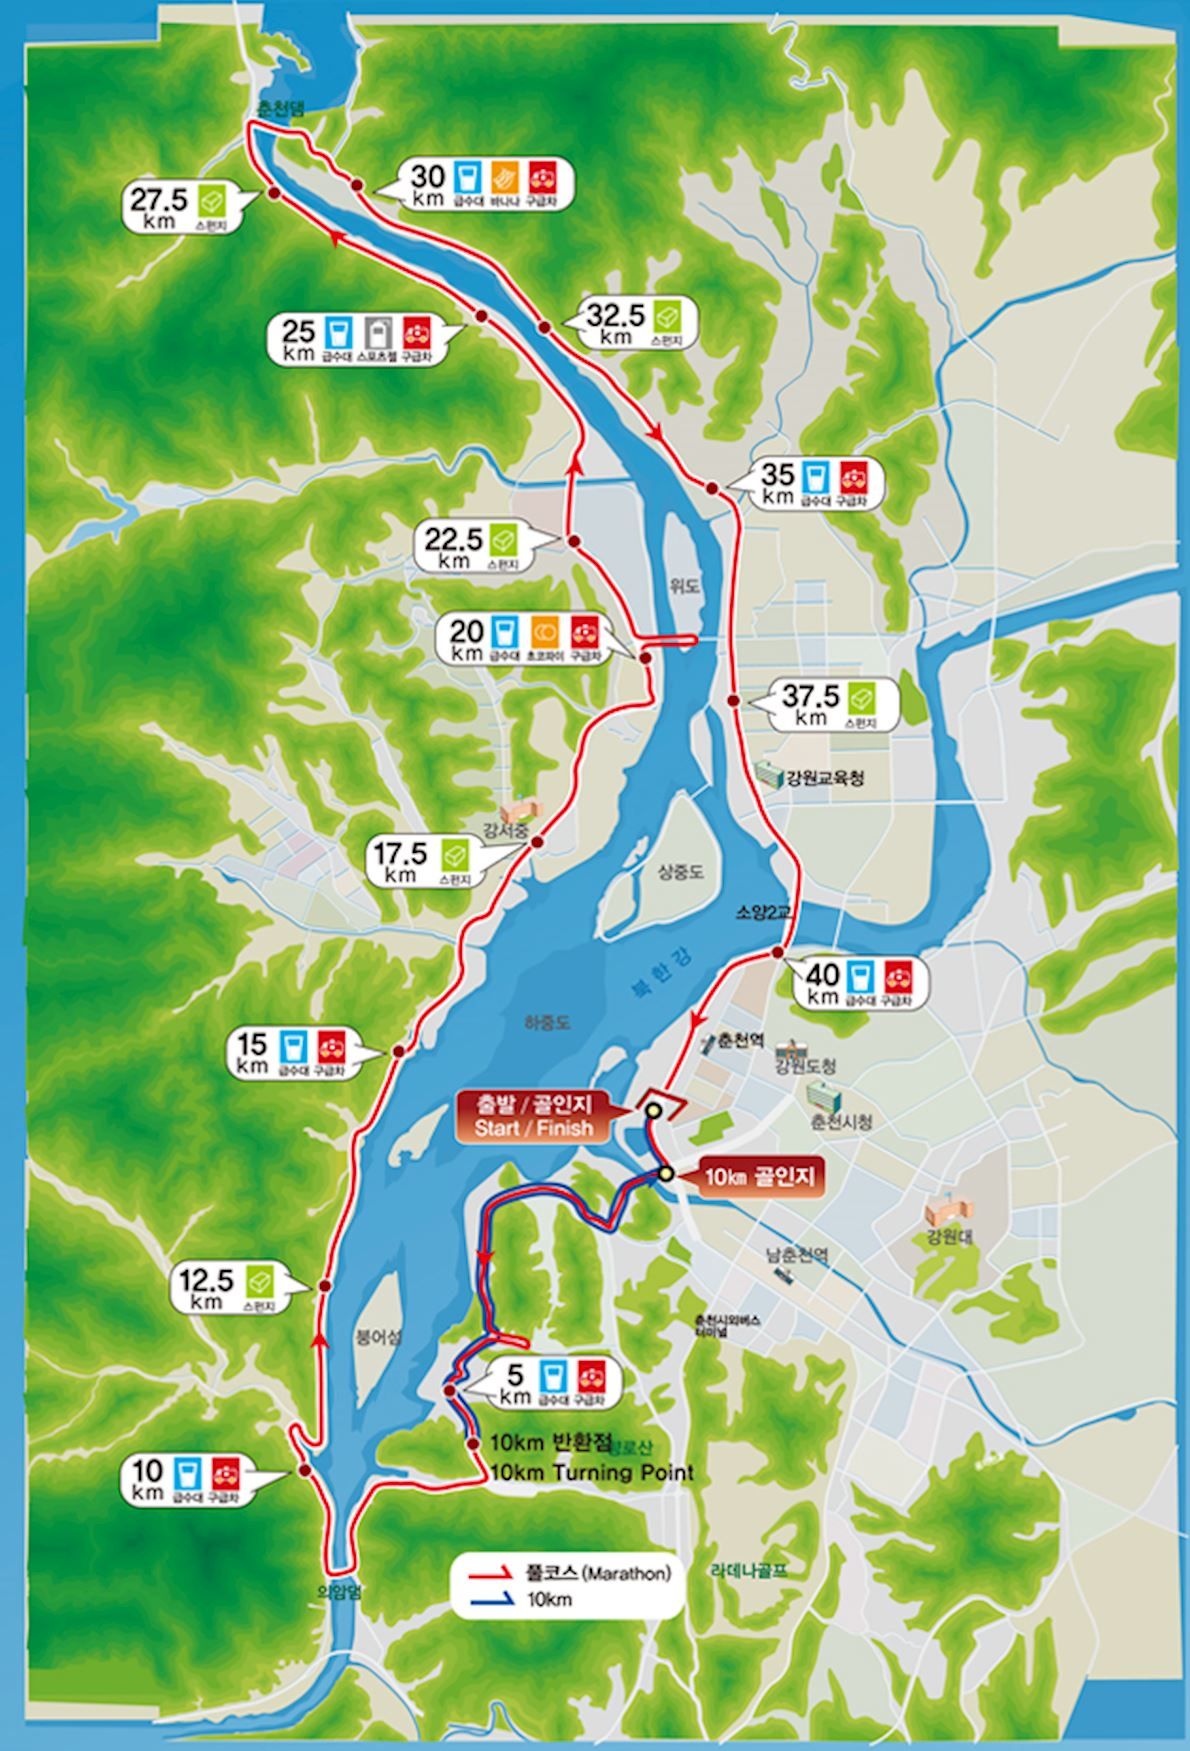 Chosunilbo Chunchon International Marathon 路线图